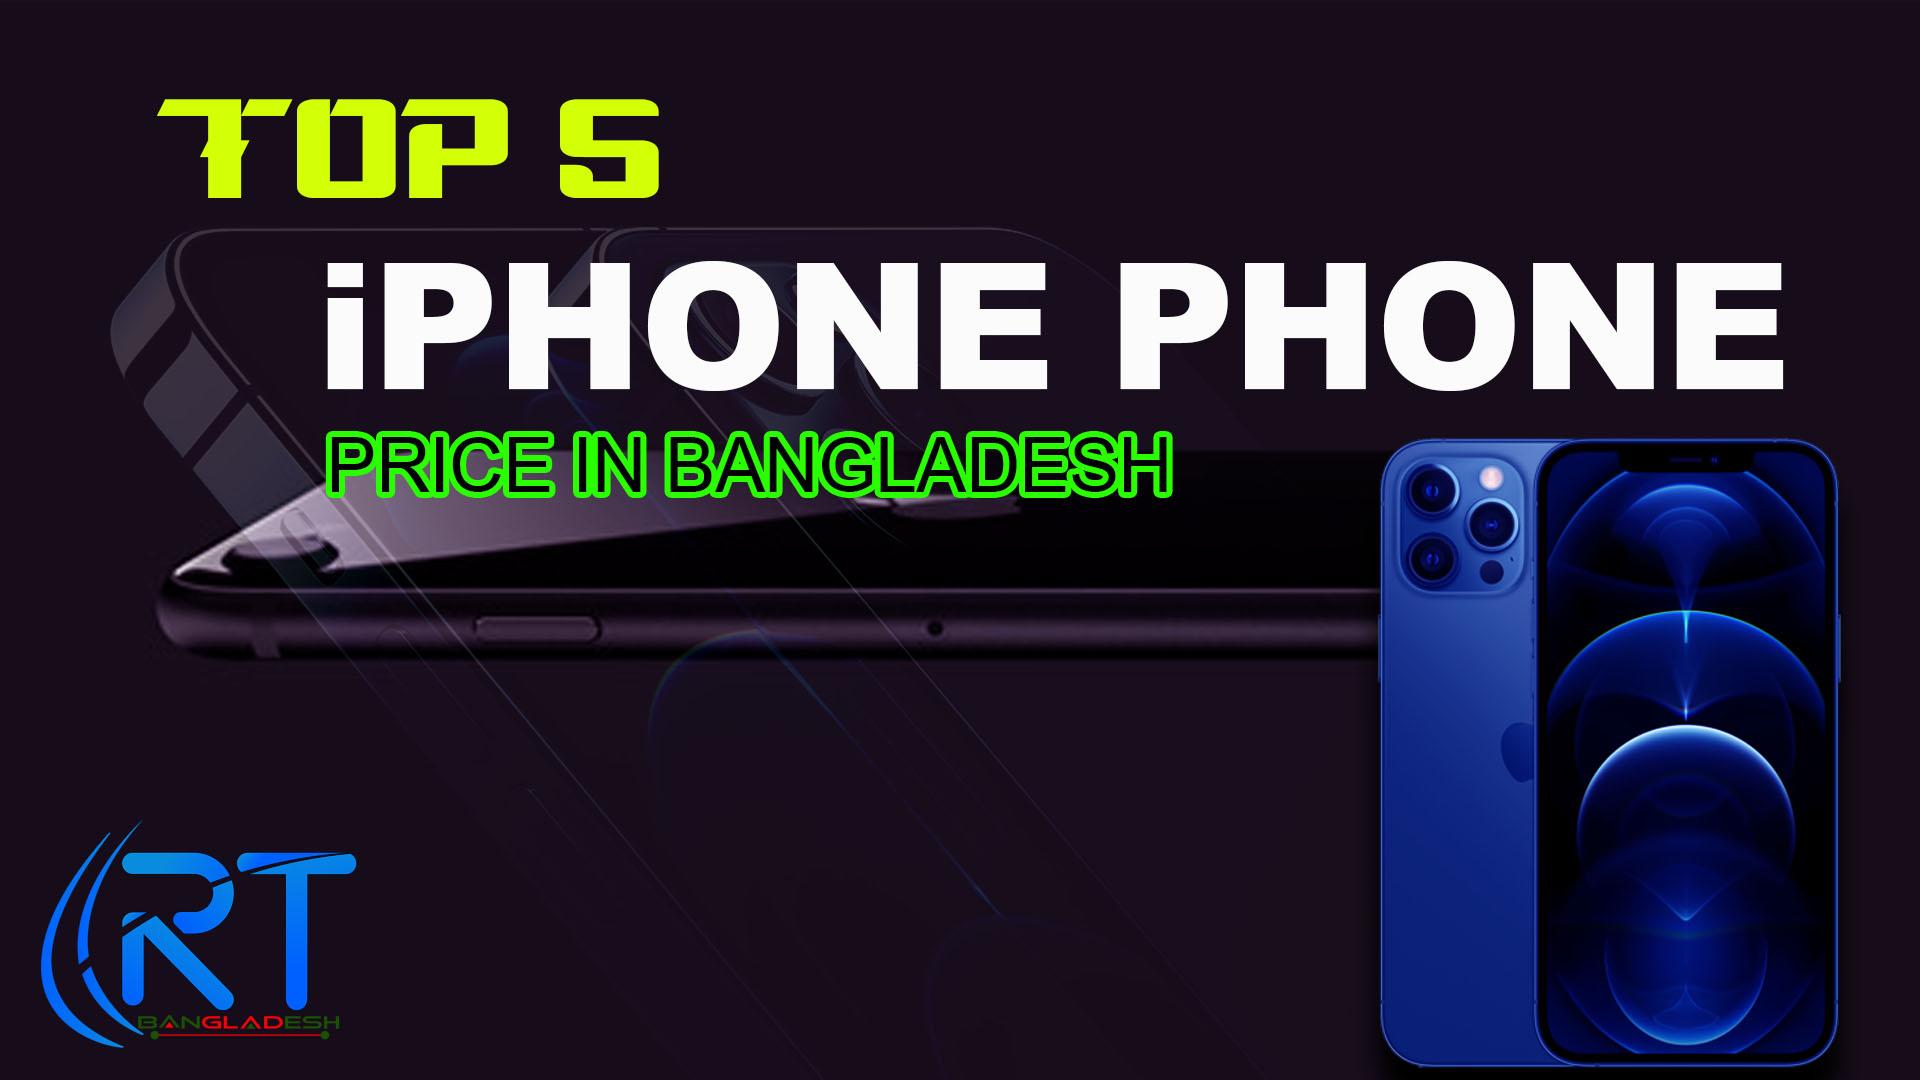 TOP 5 iPHONE PRICE IN BANGLADESH 2021